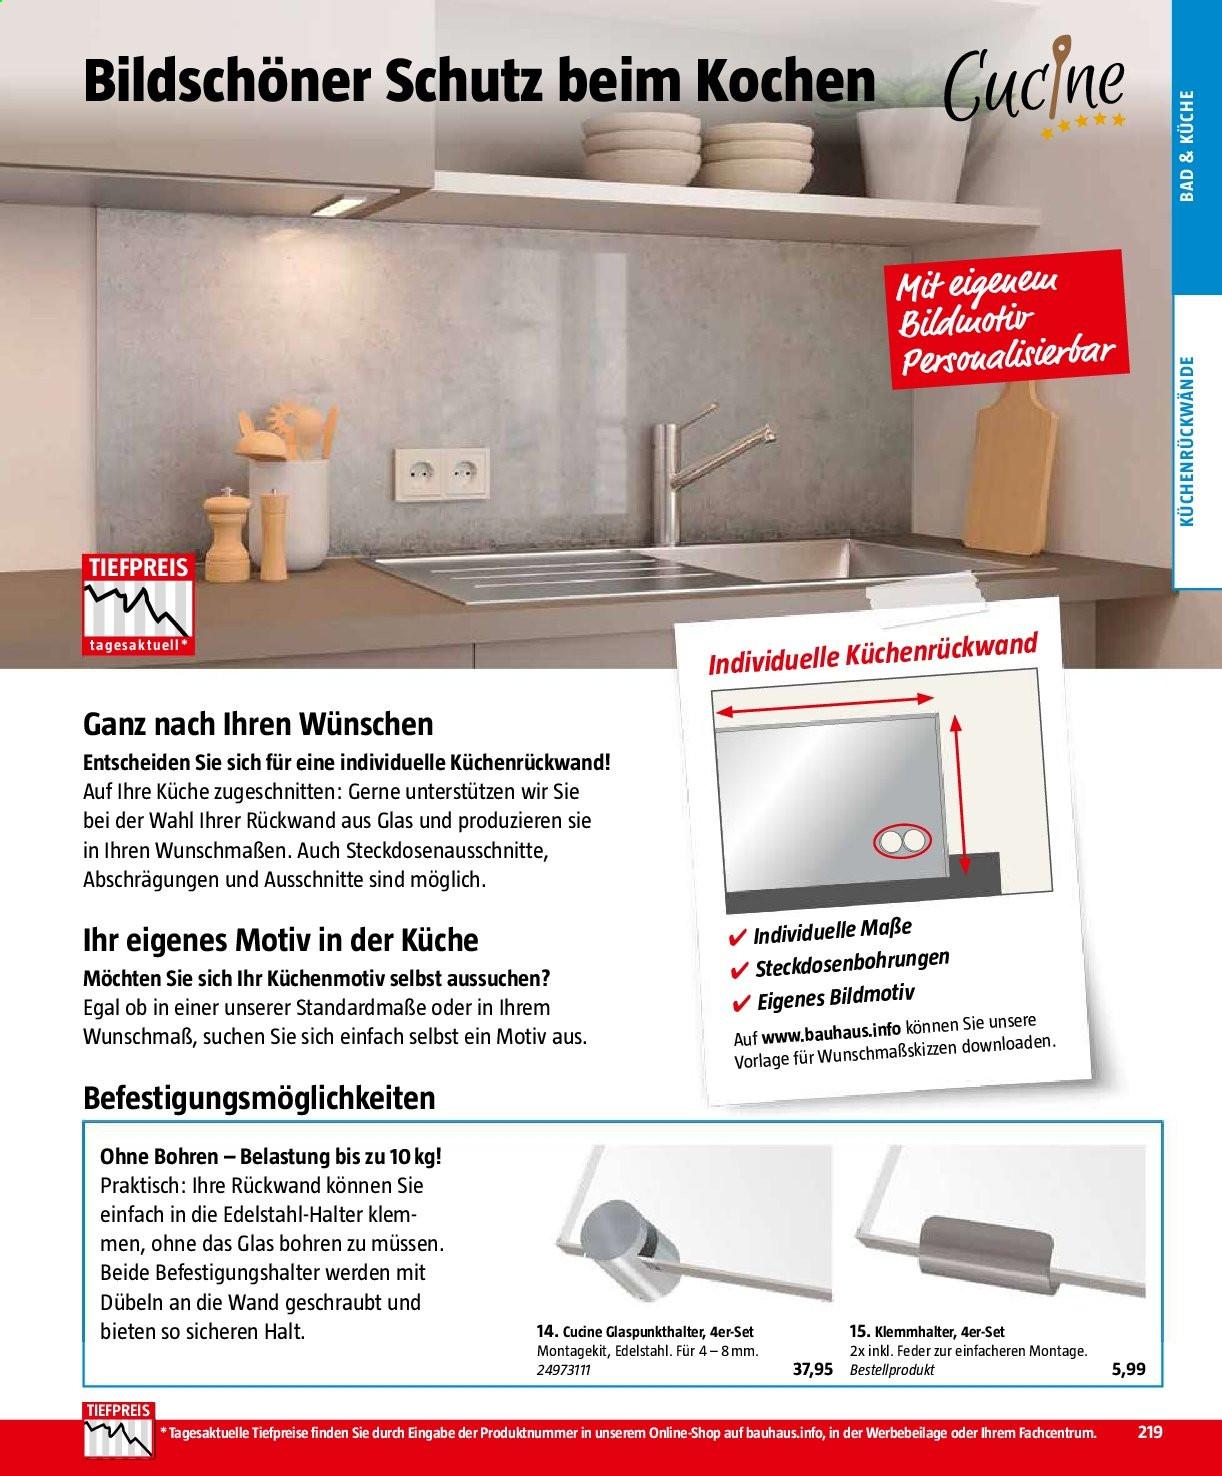 Full Size of Bauhaus Aktuelle Prospekte Rabatt Kompass Fenster Wohnzimmer Bauhaus Küchenrückwand